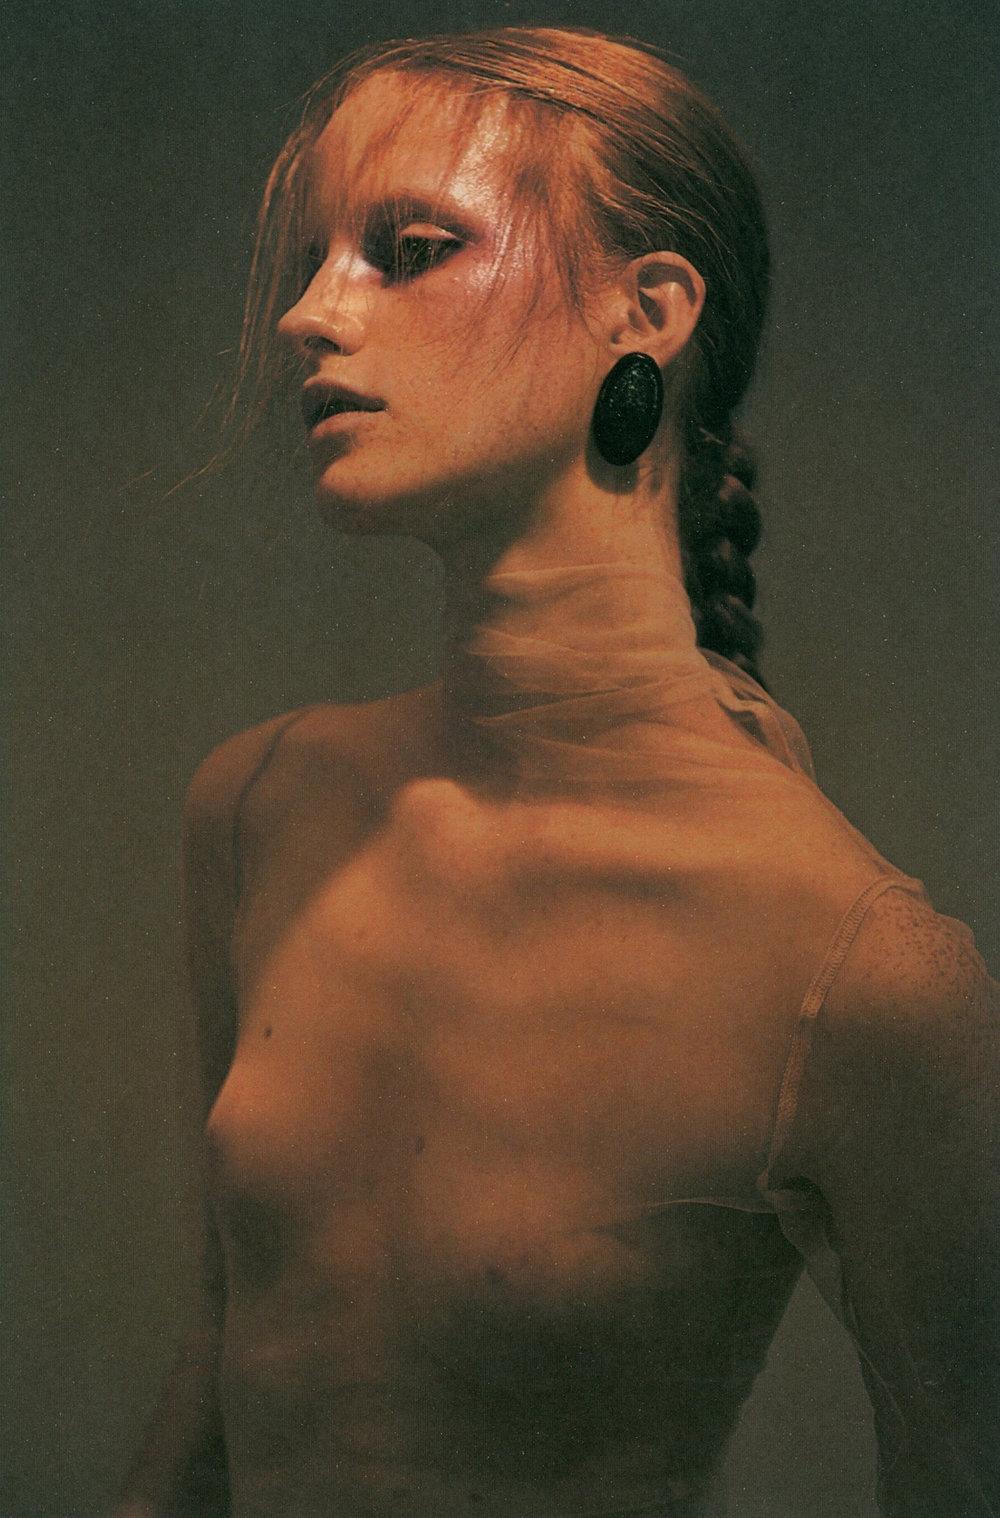 Magdalena_Jasek-Magdalena_Łuniewska-Sezon_Magazine-faves.jpg